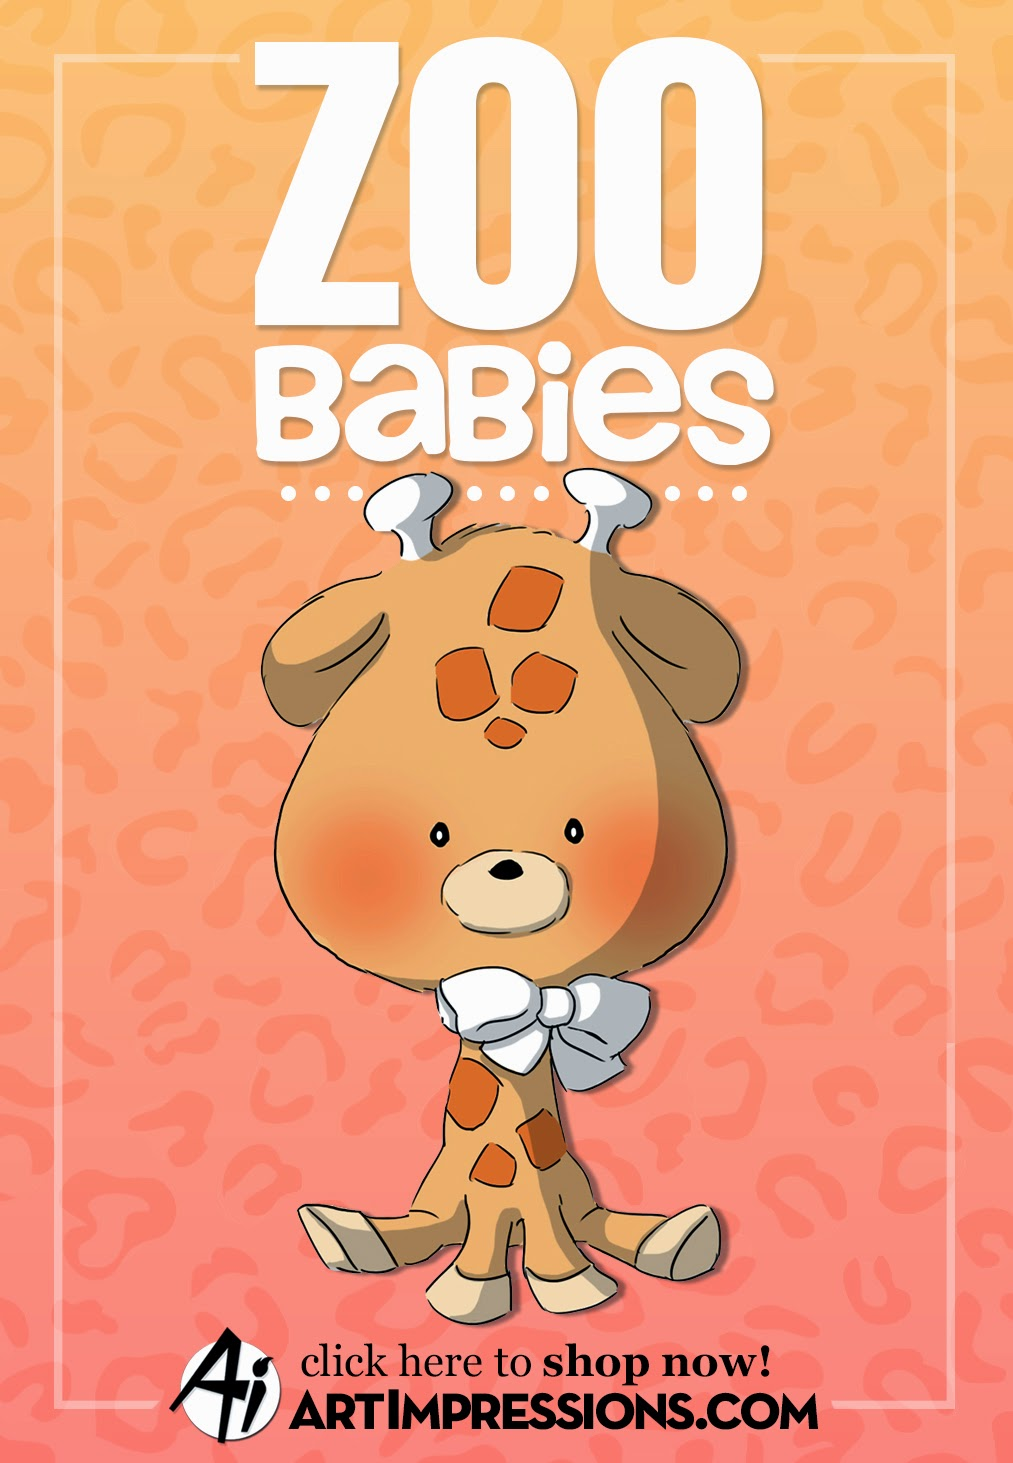 http://www.artimpressions.com/ListProds.asp?Cat=+++++++++++++++WHATS+NEW%3F&SubCat=Zoo+Babies